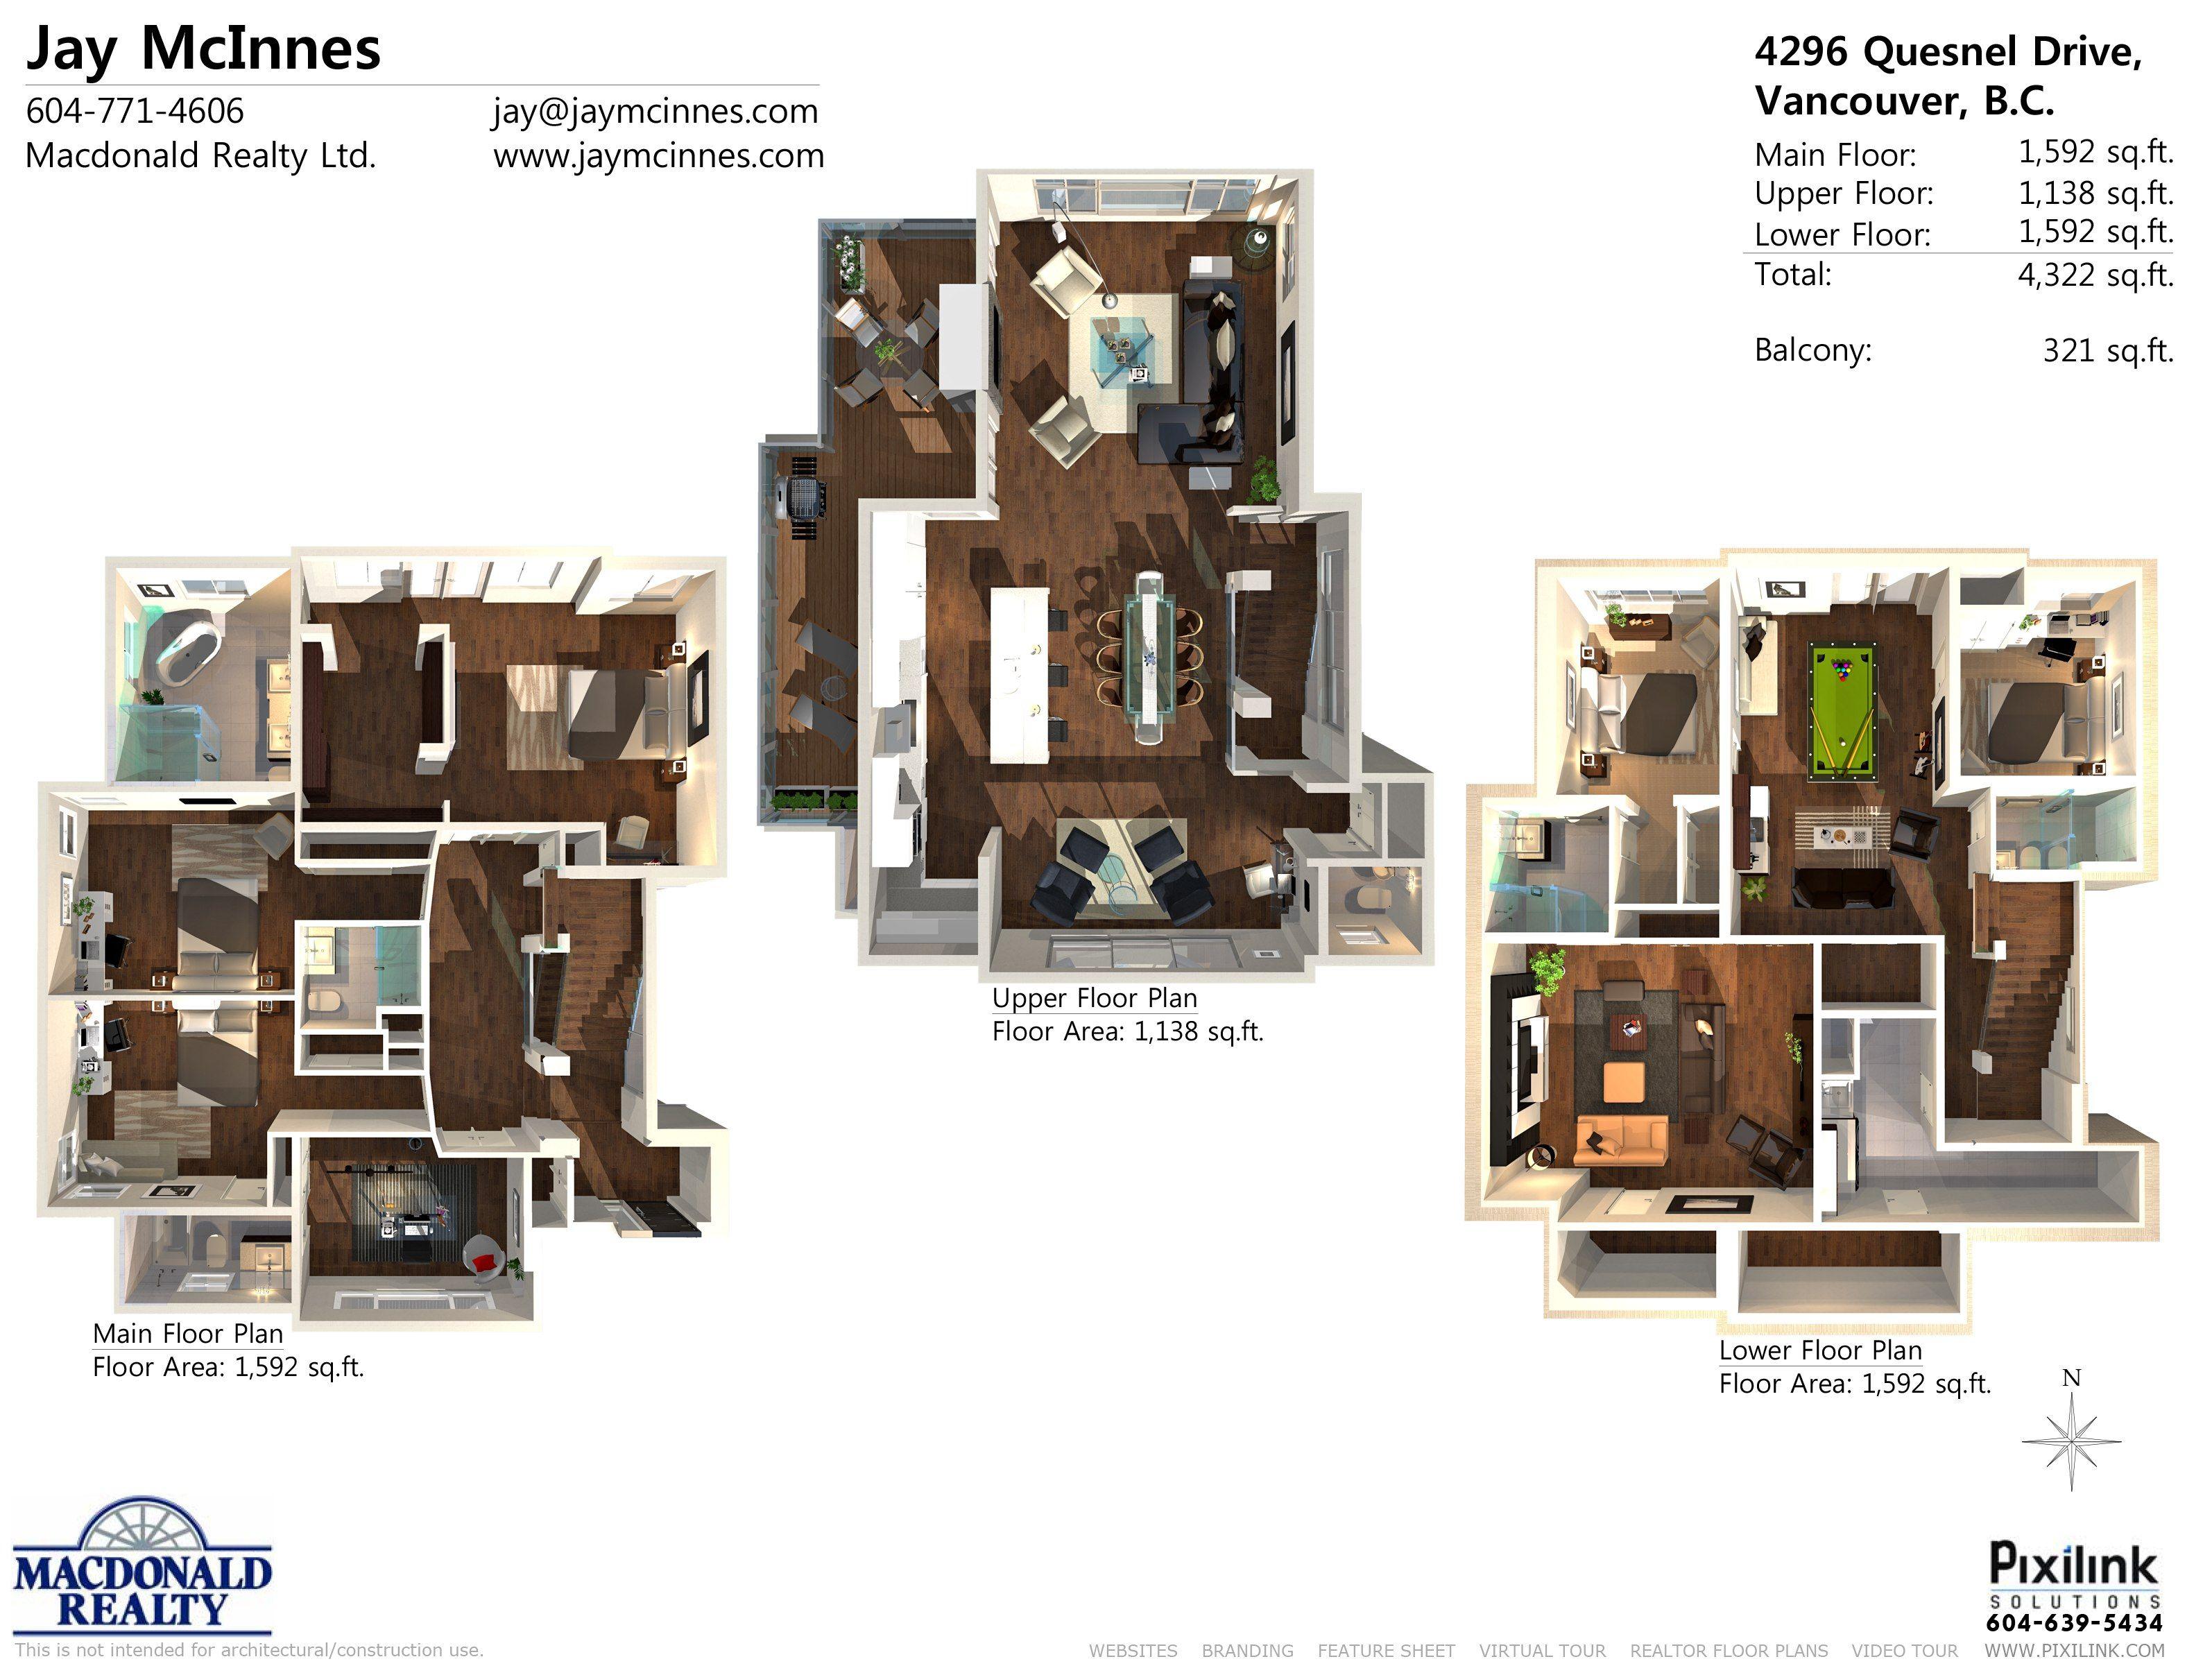 3d Mansion Floor Plans - Google Search